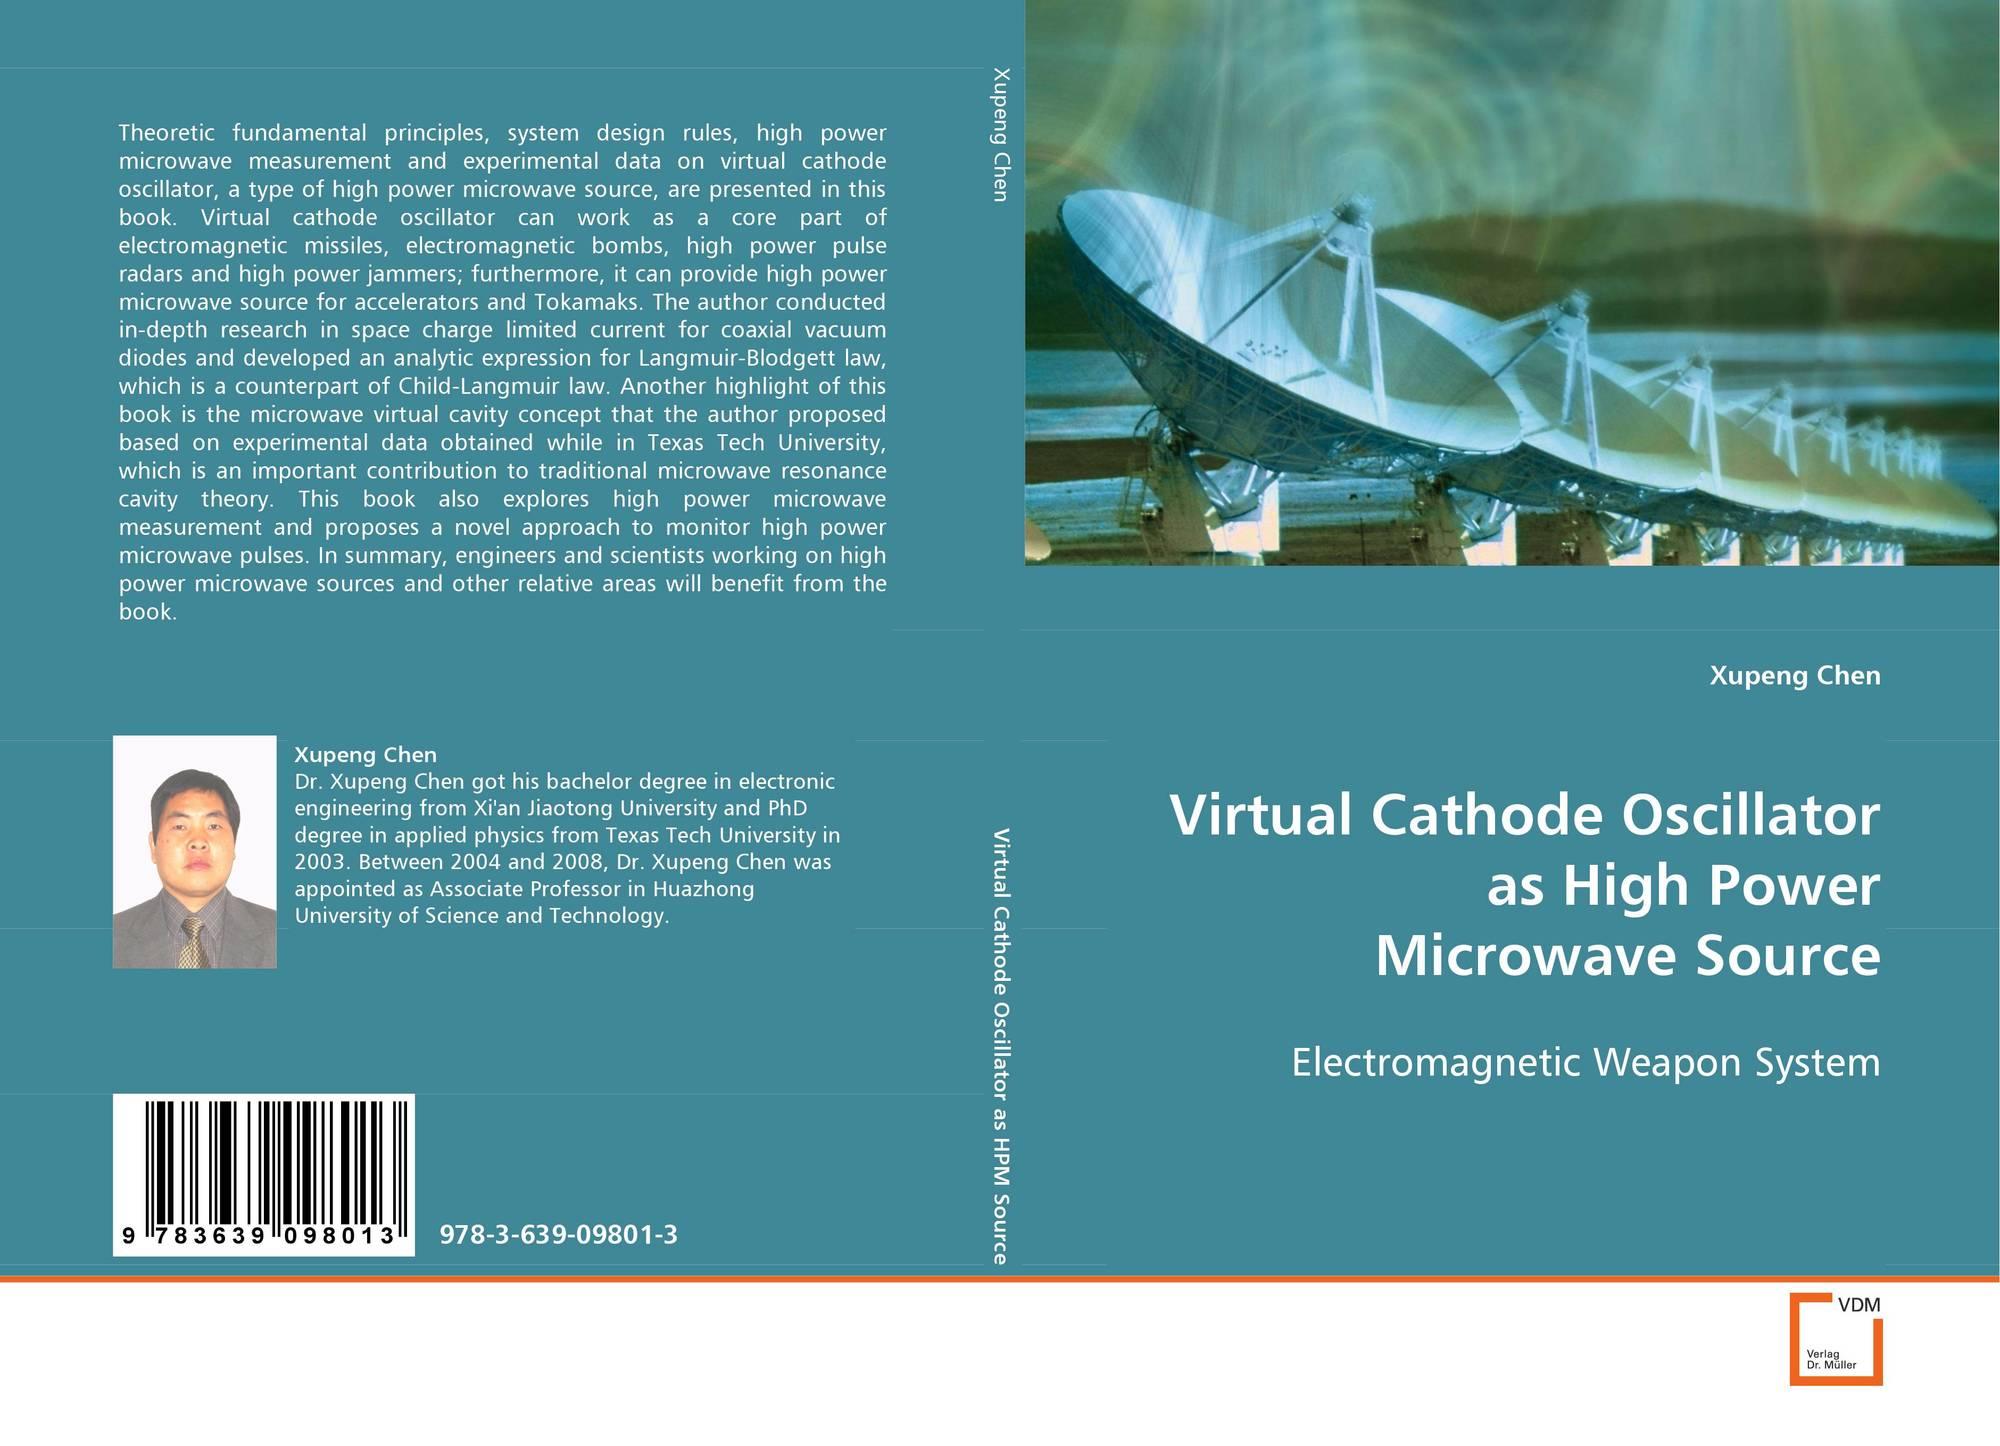 Virtual Cathode Oscillator as High Power Microwave Source, 978-3-639